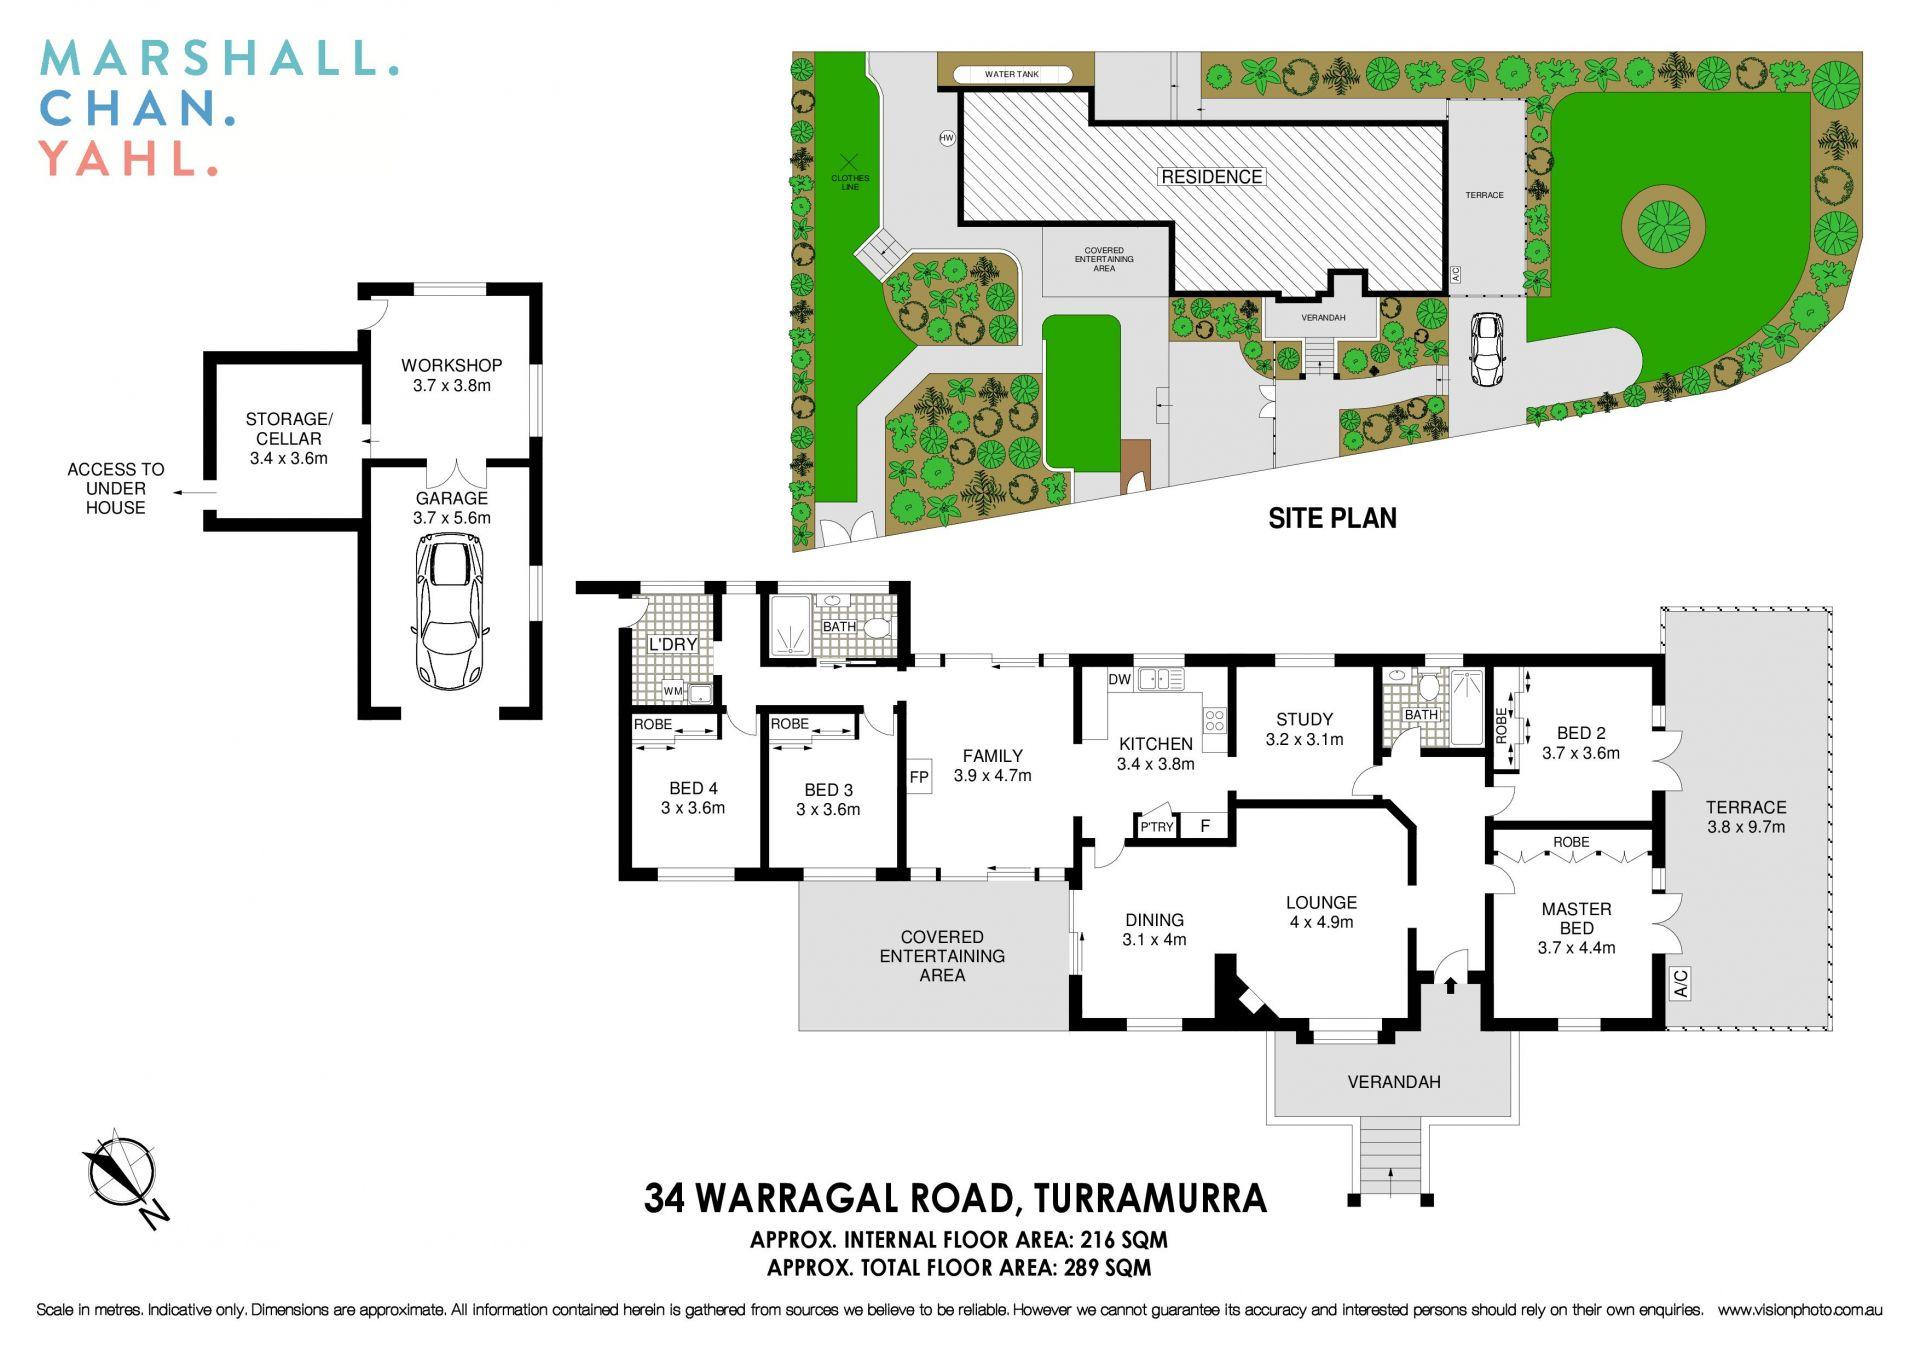 34 Warragal Road Turramurra 2074